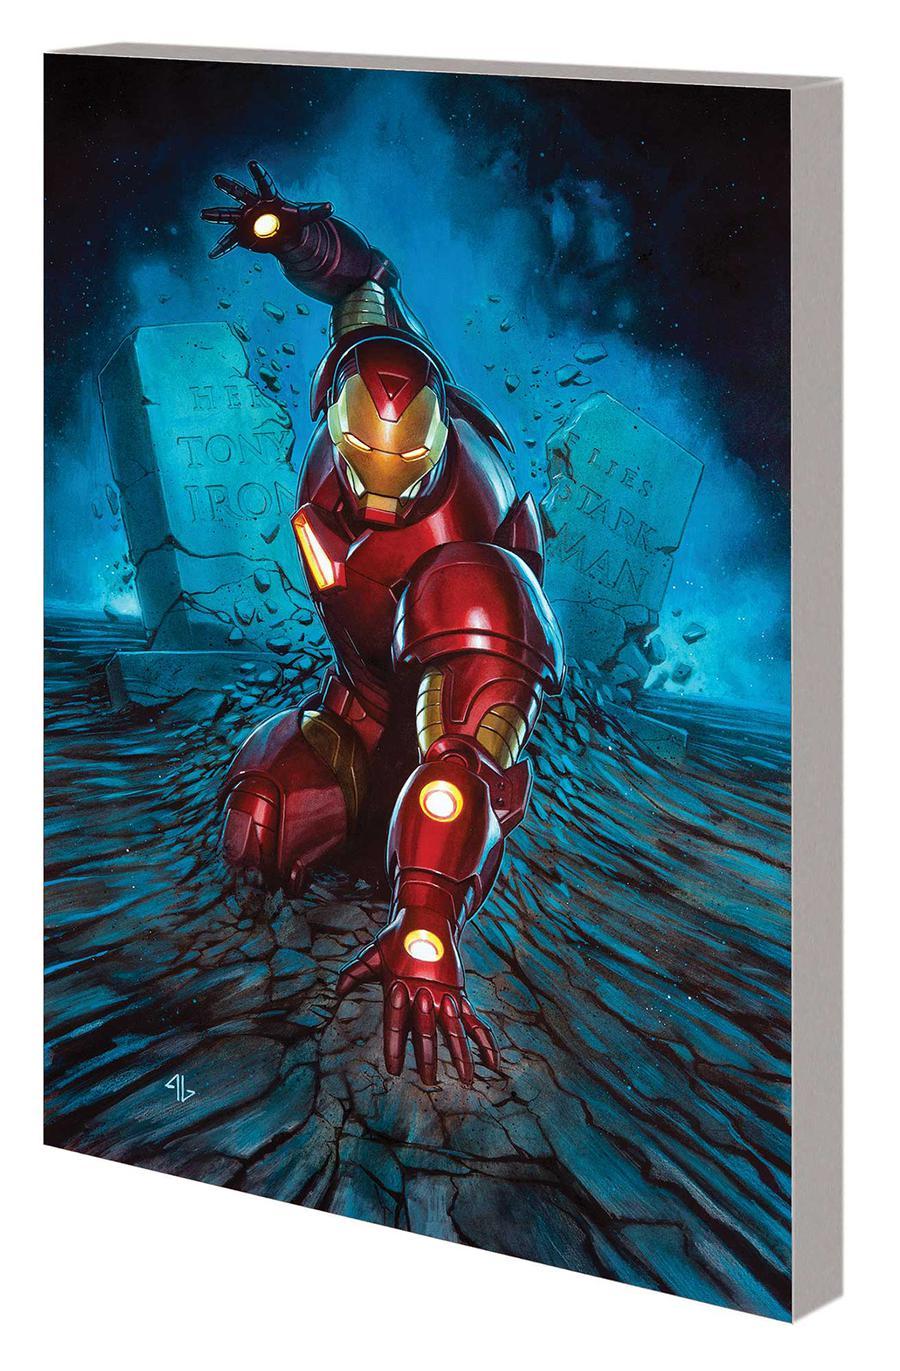 Marvel Monograph Vol 1 Art Of Adi Granov TP